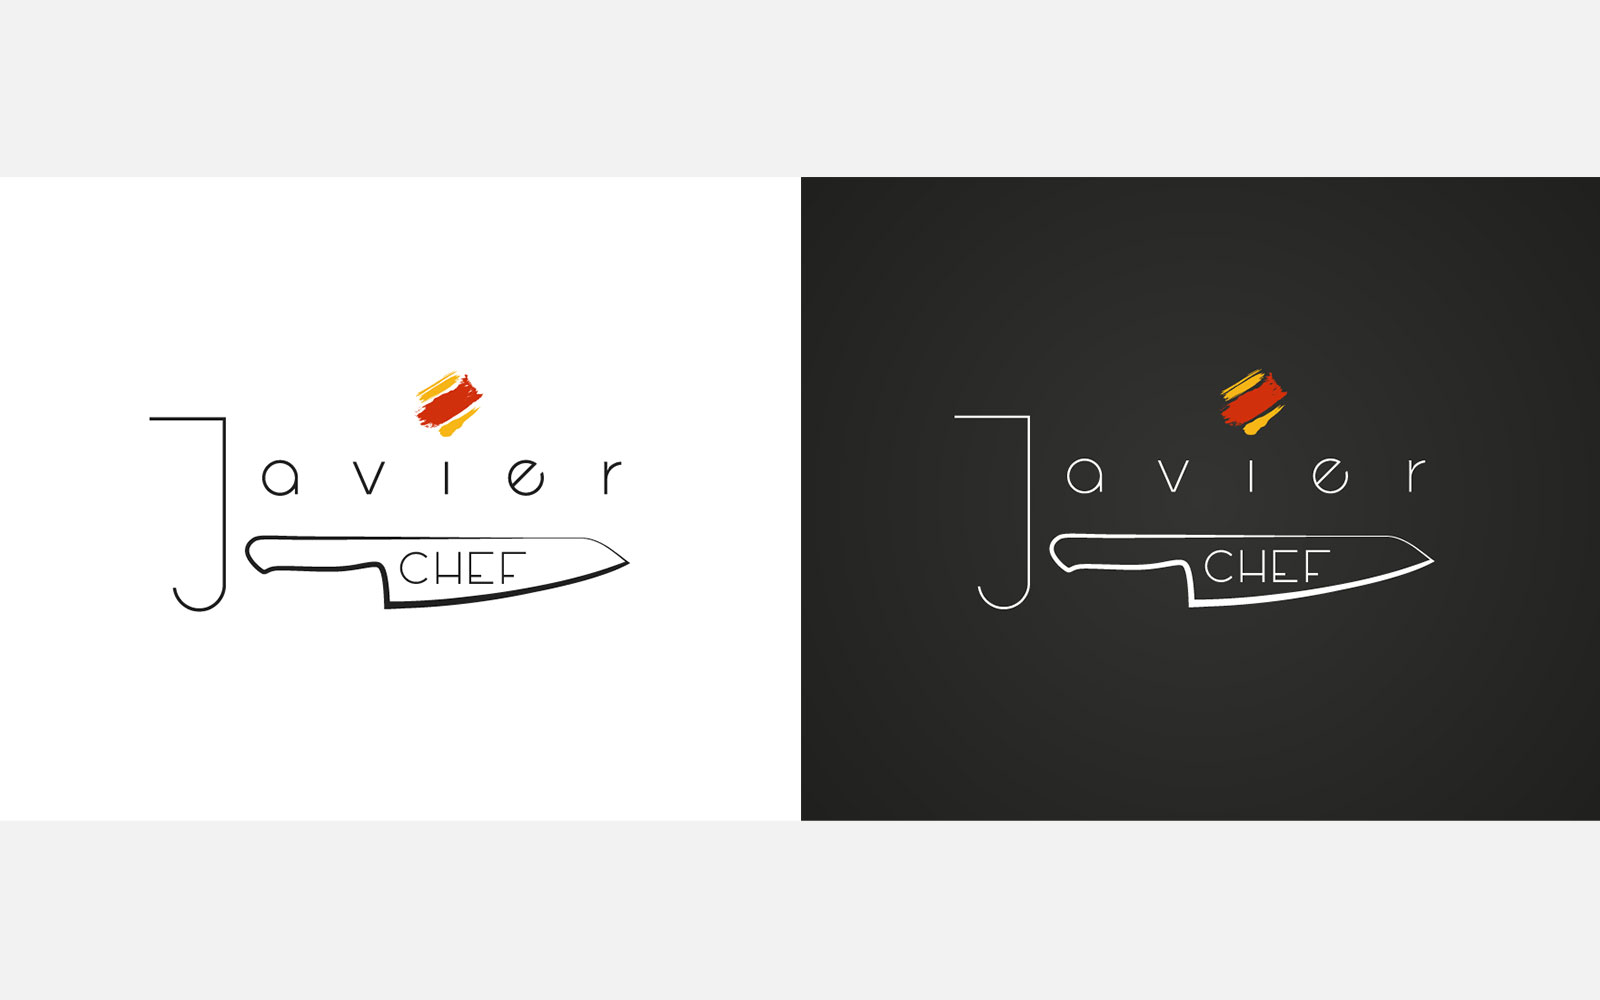 BL-Graphics - Javier - logos